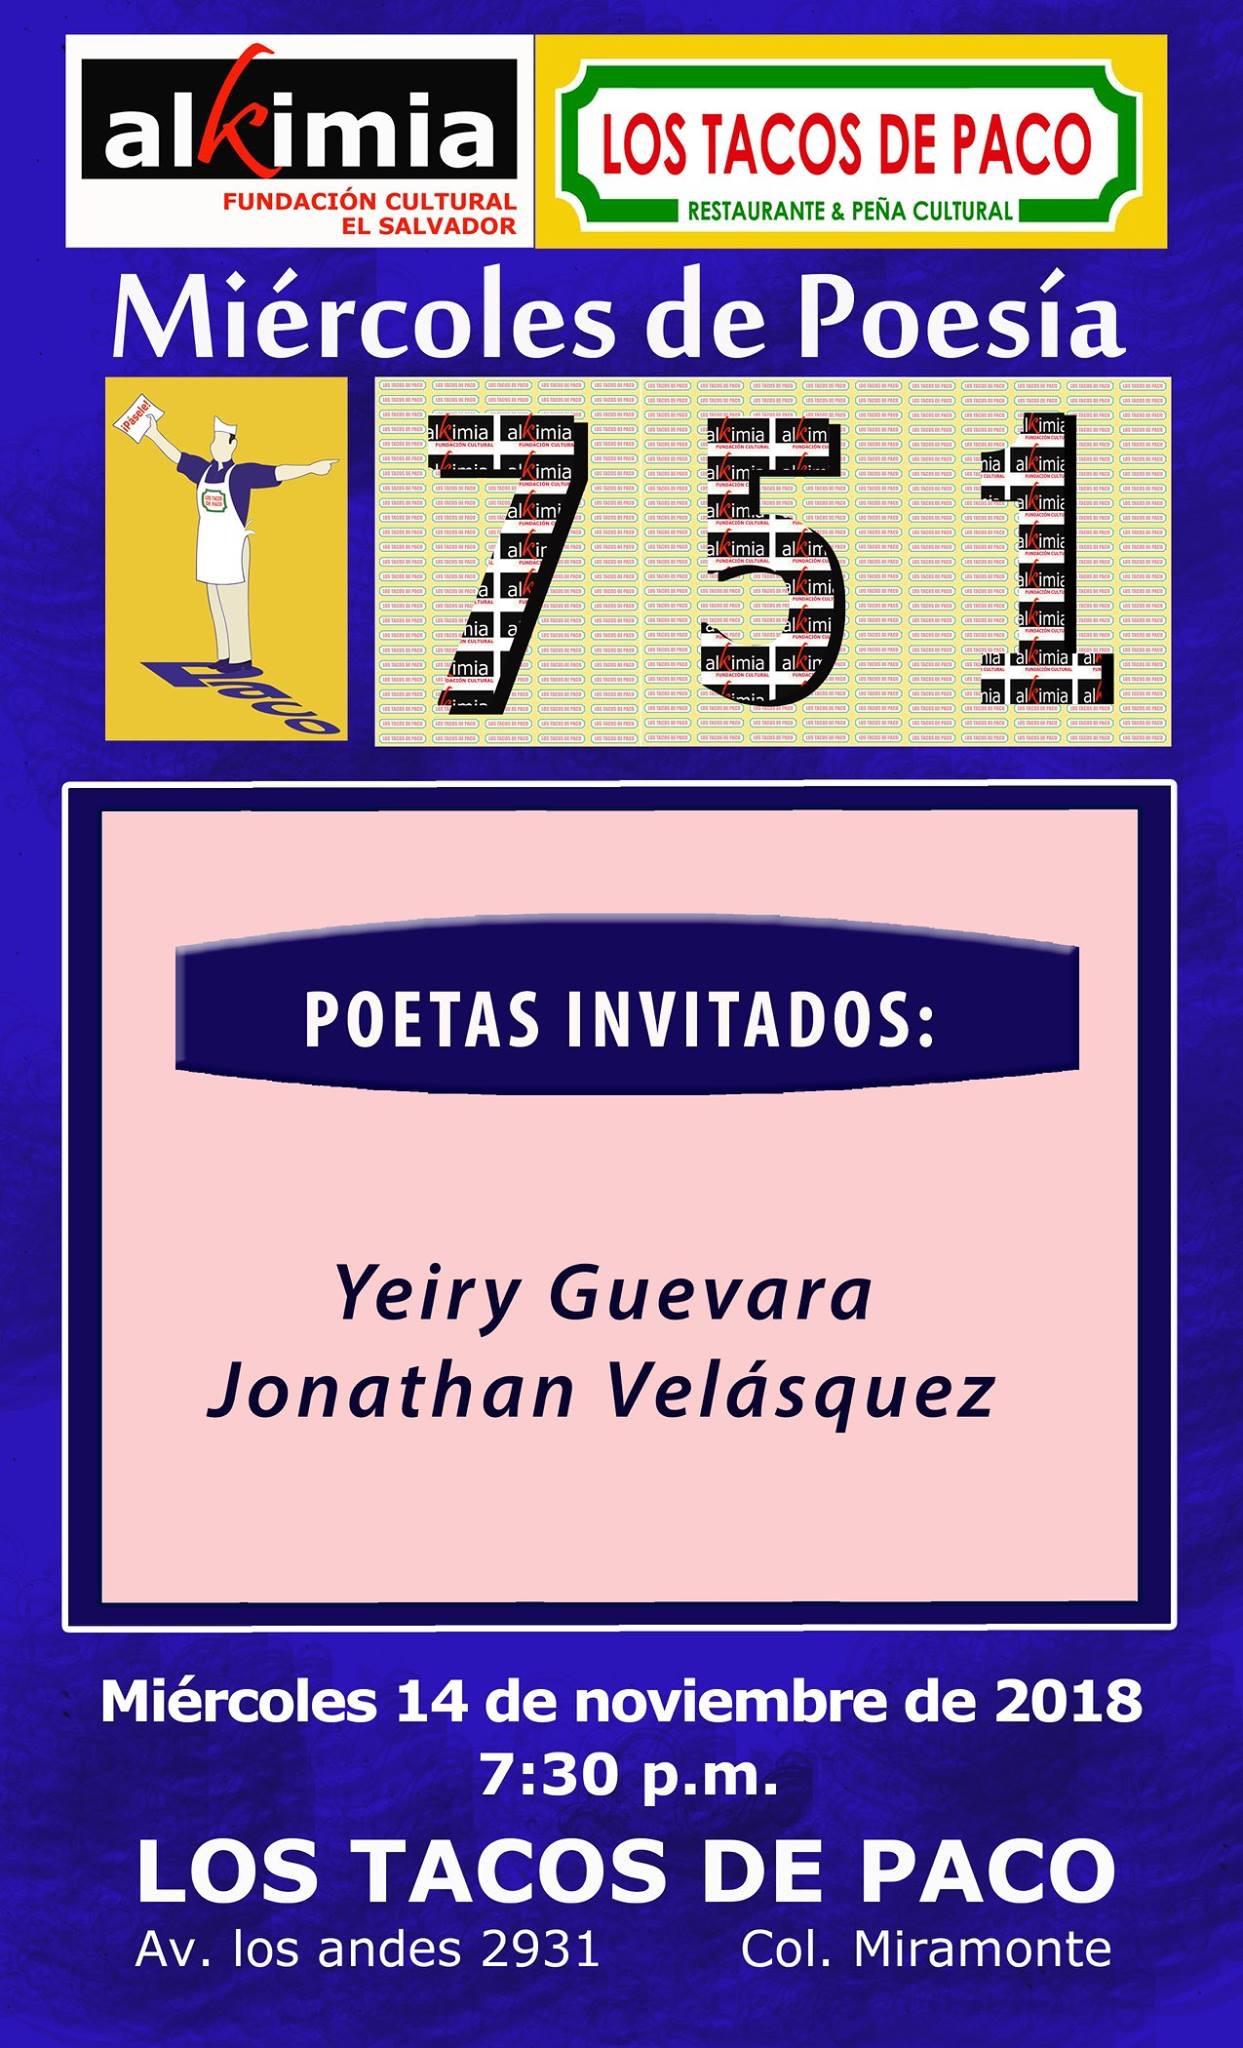 IMG_1778.JPG